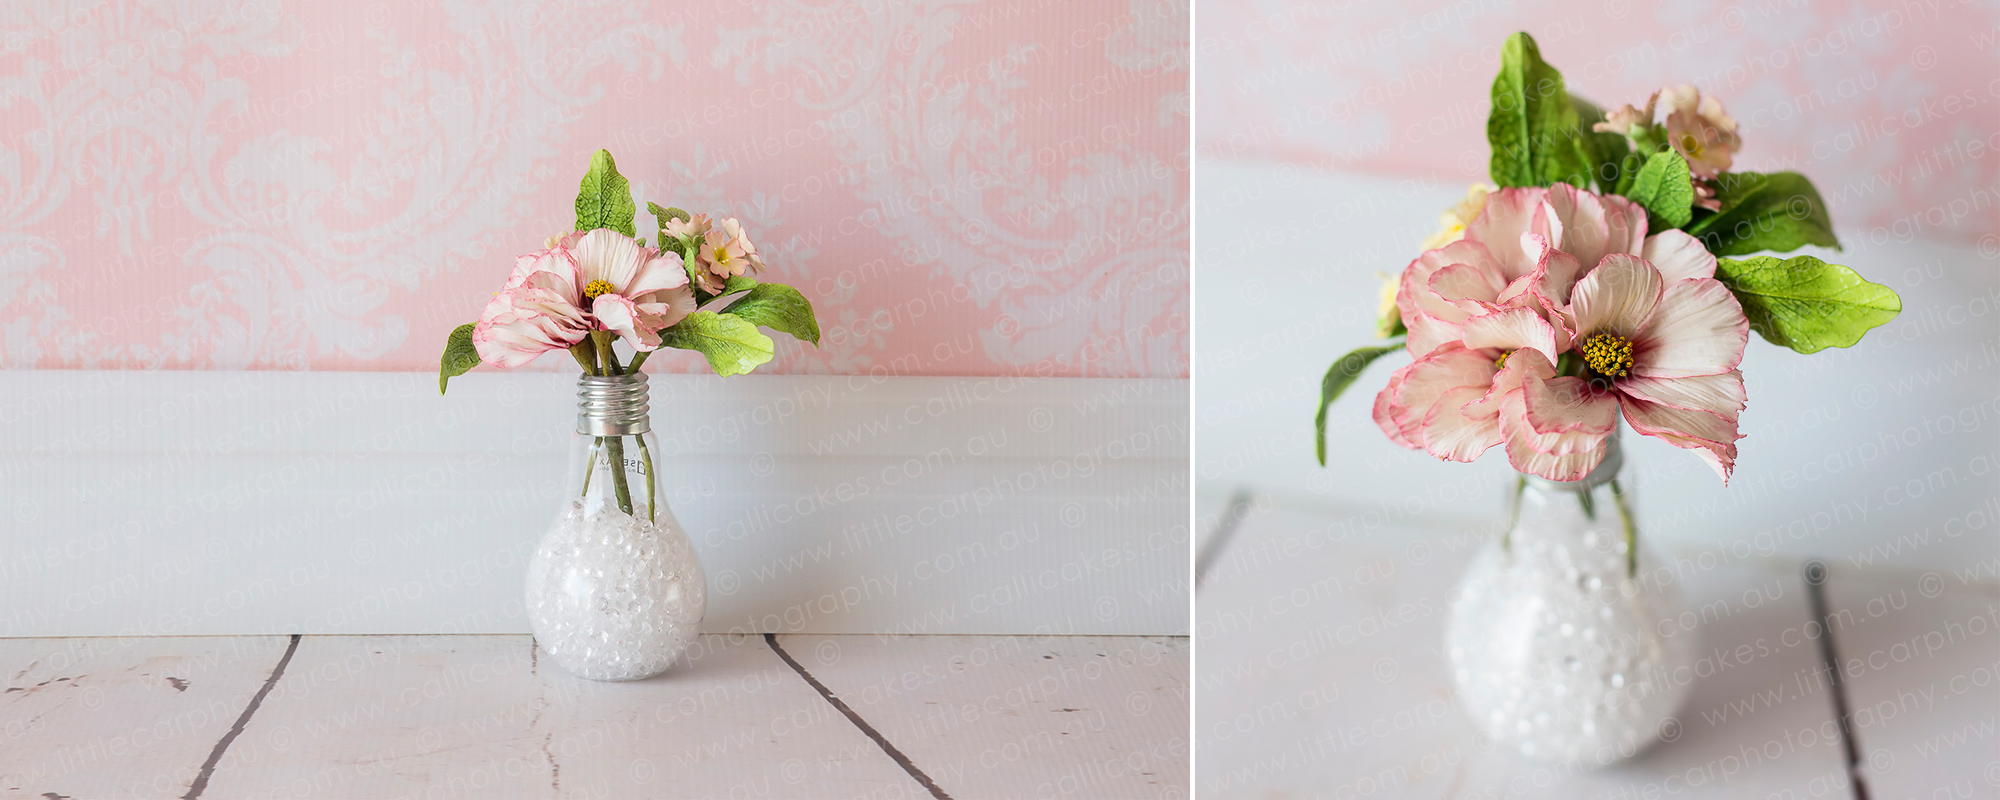 6 Wedding Photography of Sugar Art contemporary small bouquet.jpg